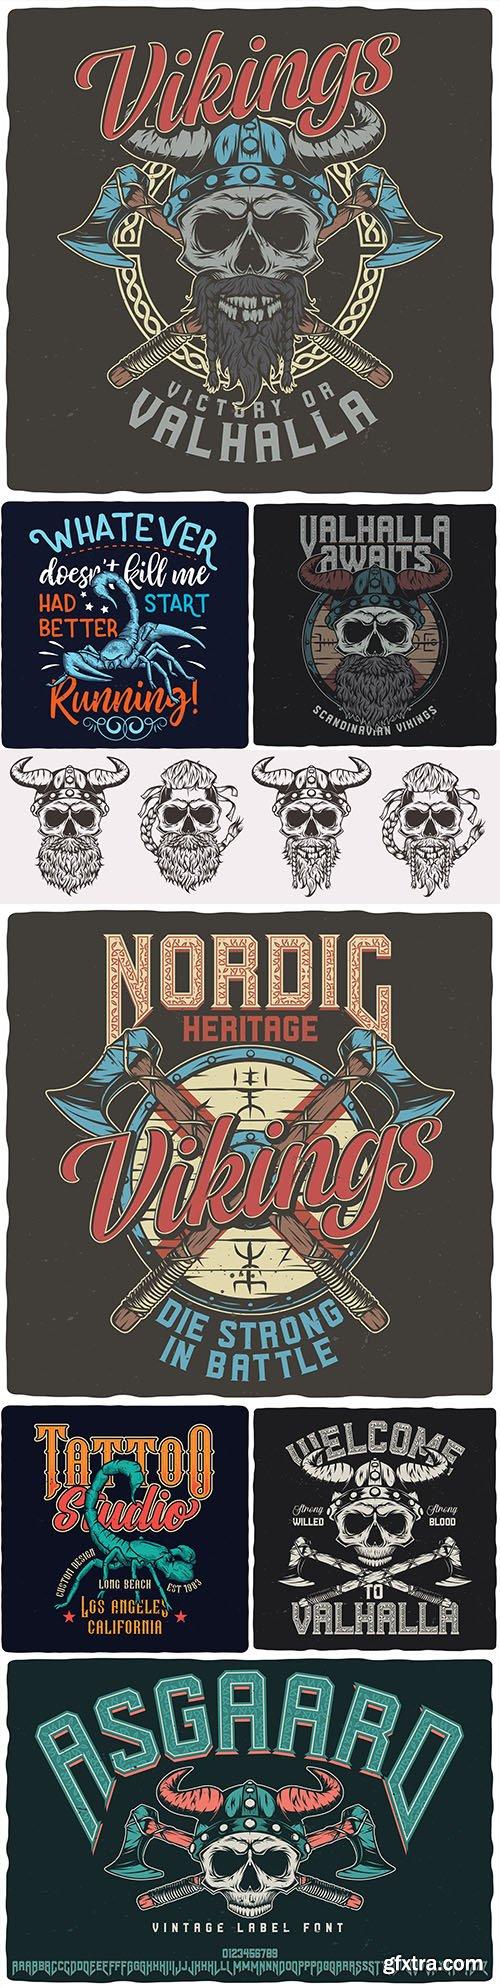 Scorpion and Viking vintage design tattoo illustrations